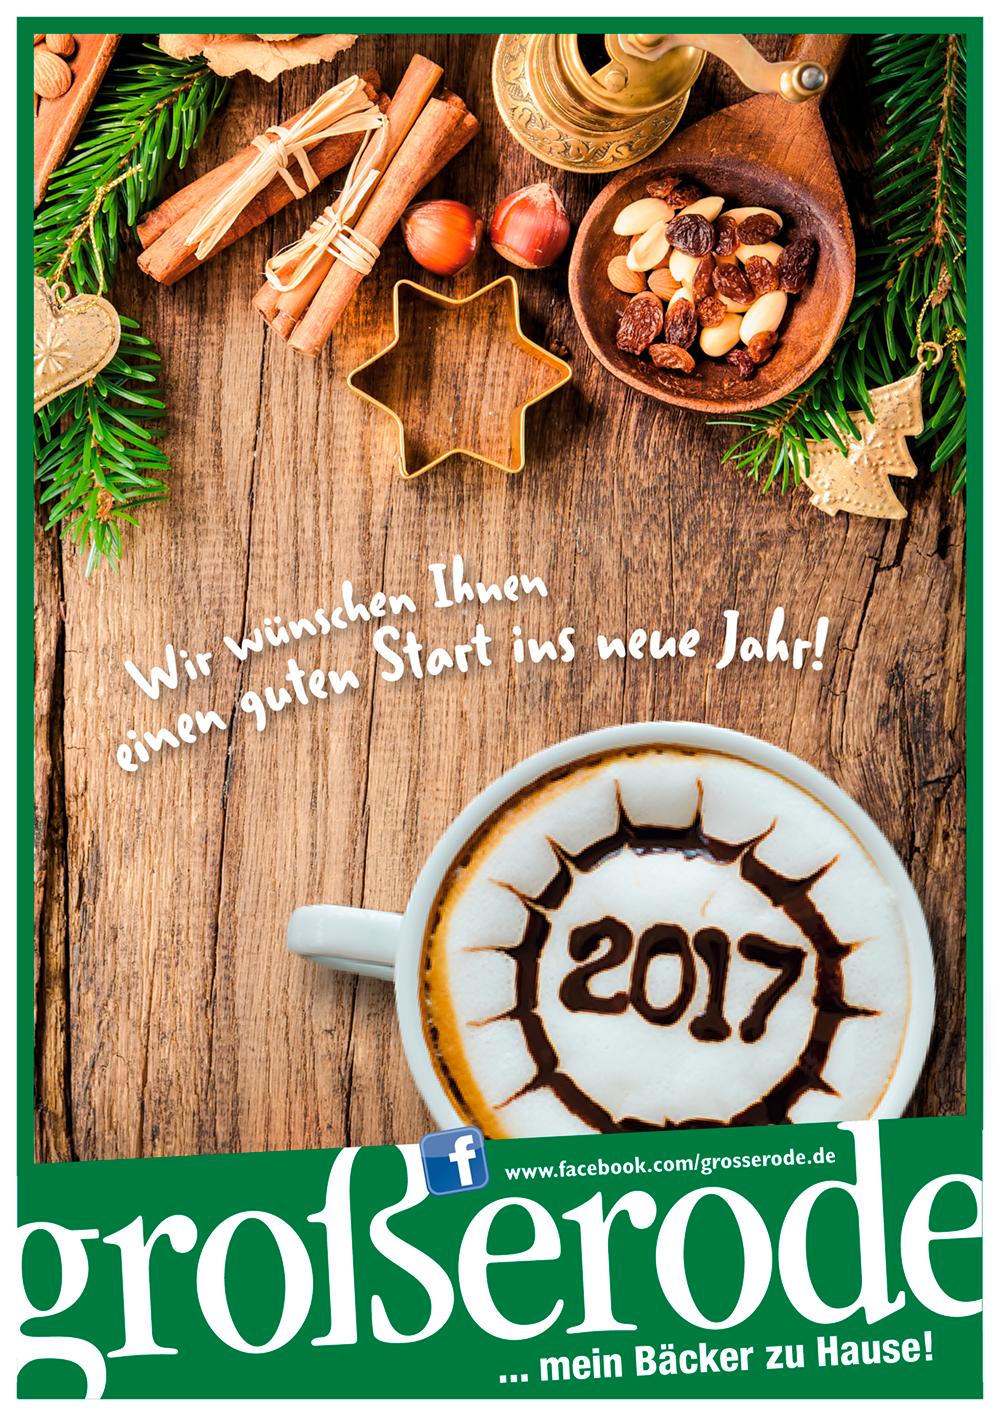 20161220_Grosserode_Jahreswechsel_Web.png